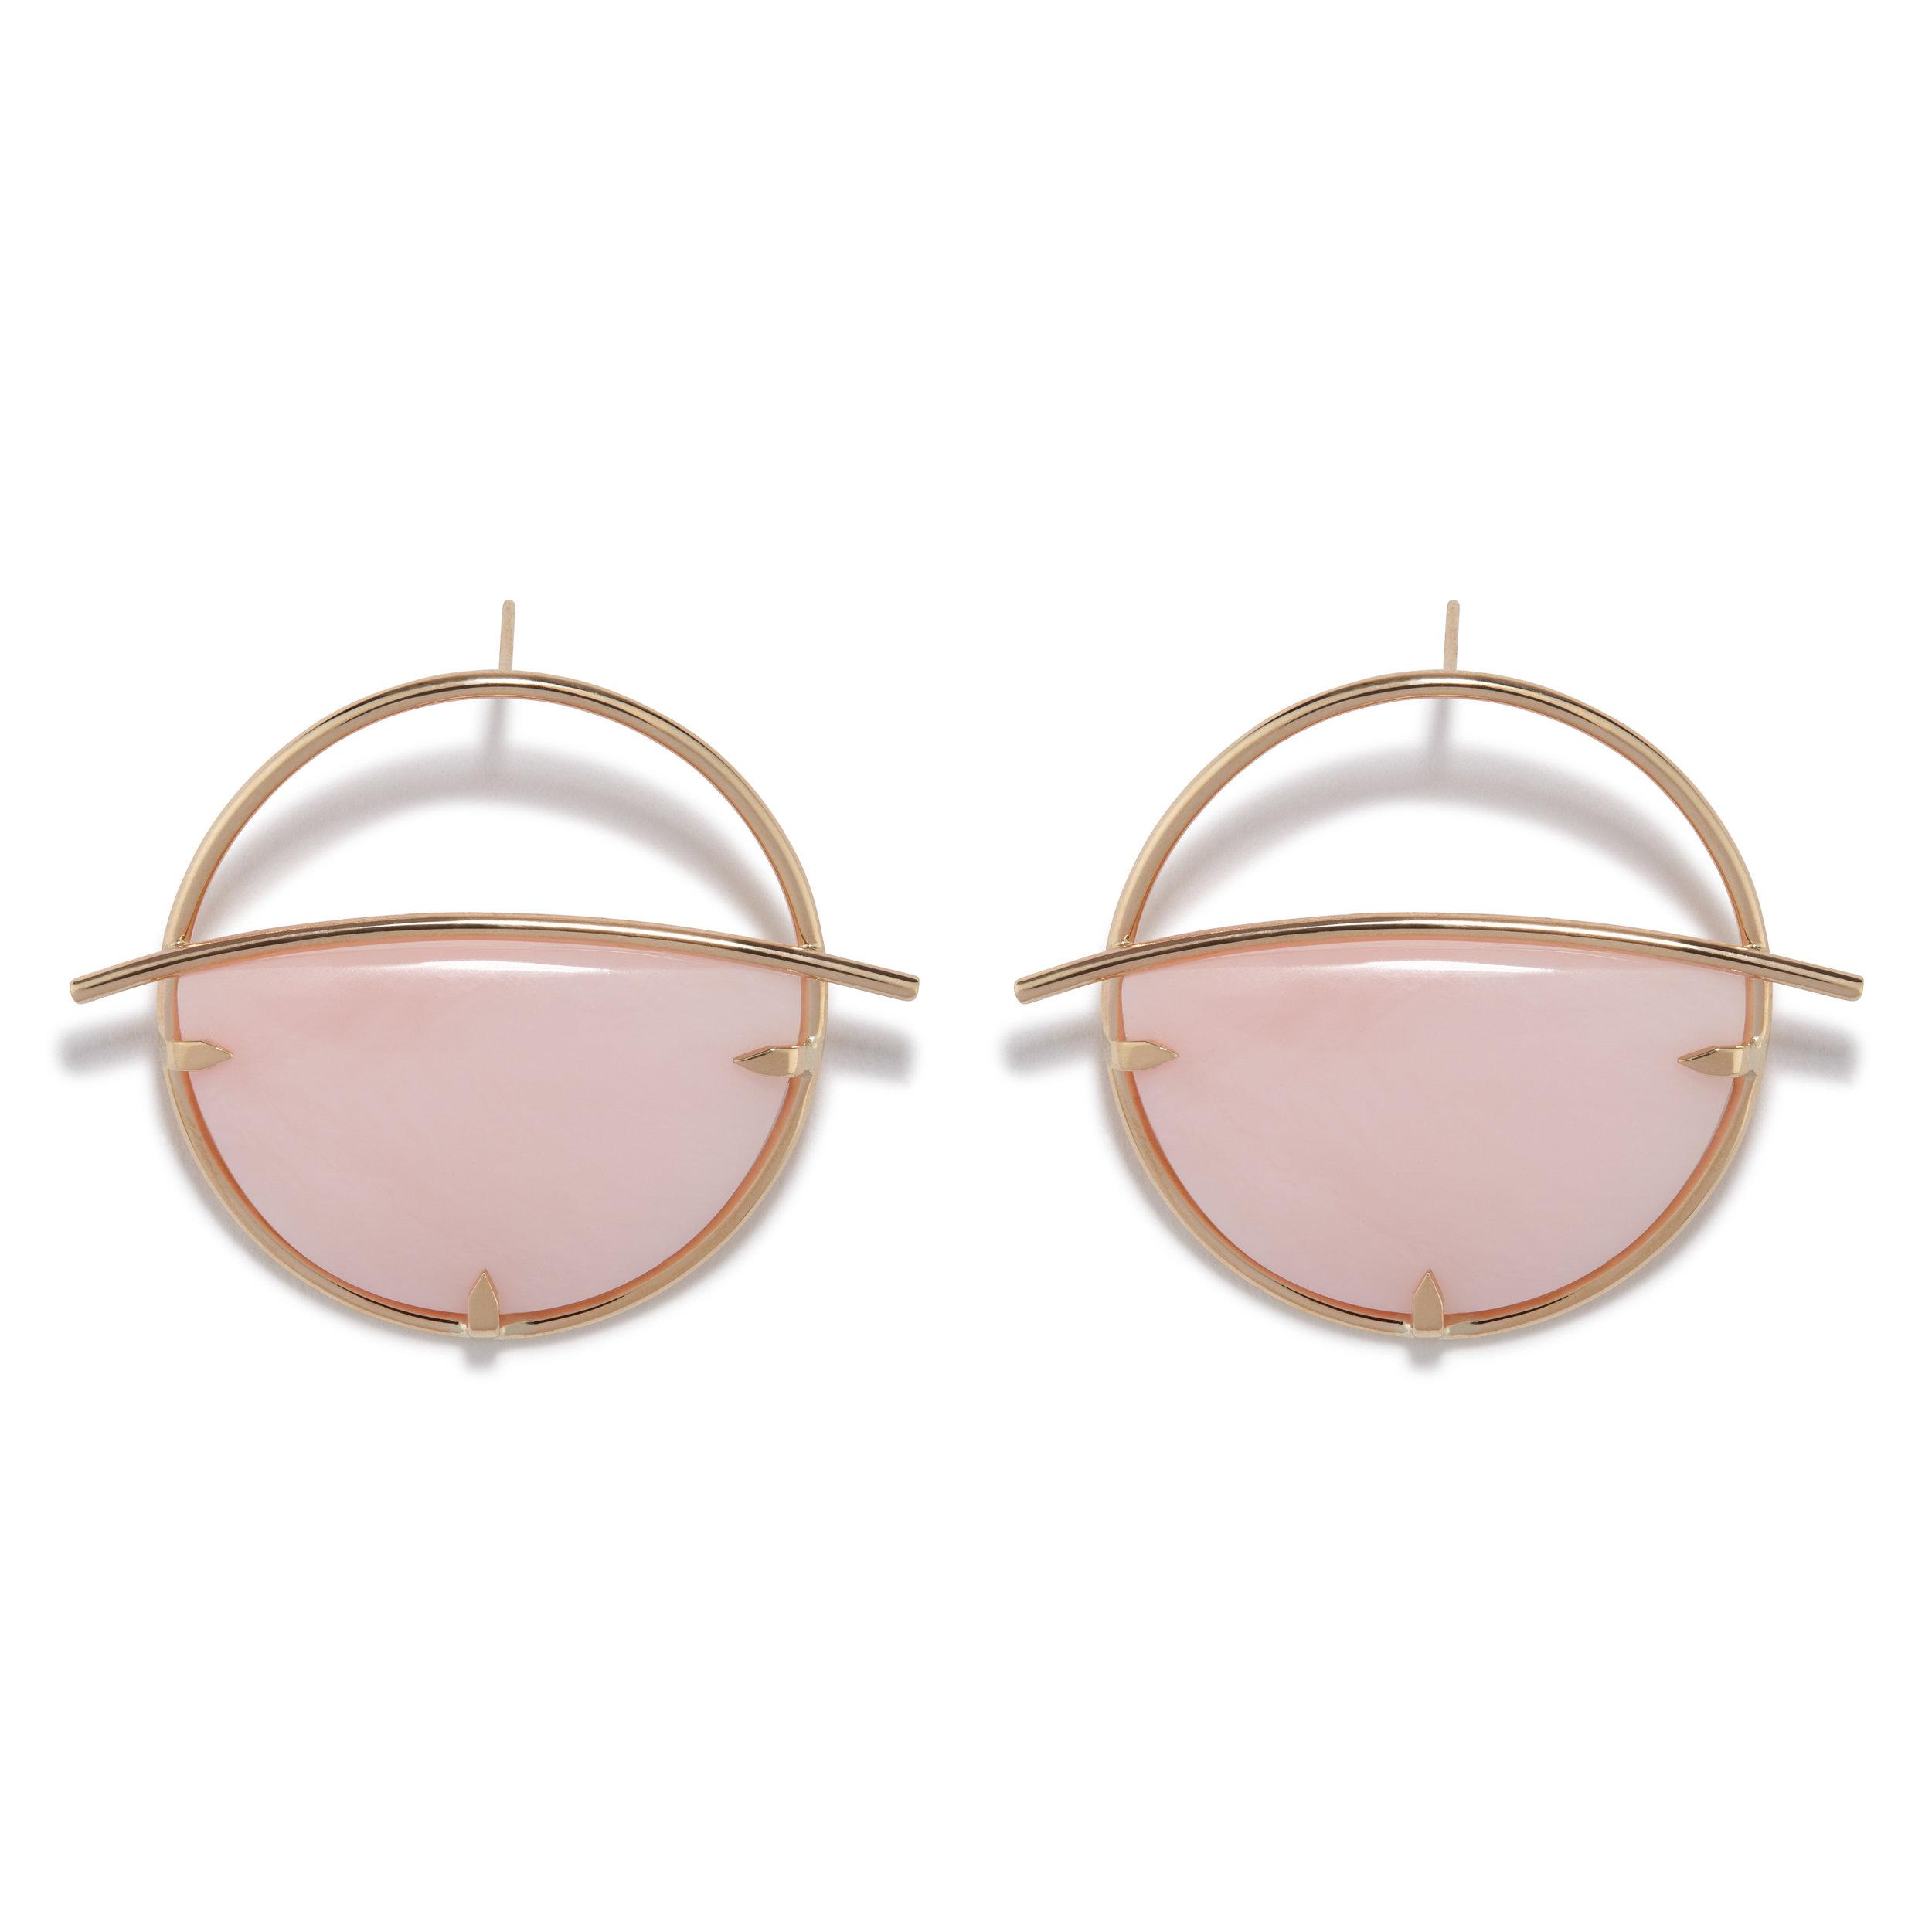 Circe Earrings - Pink Opal